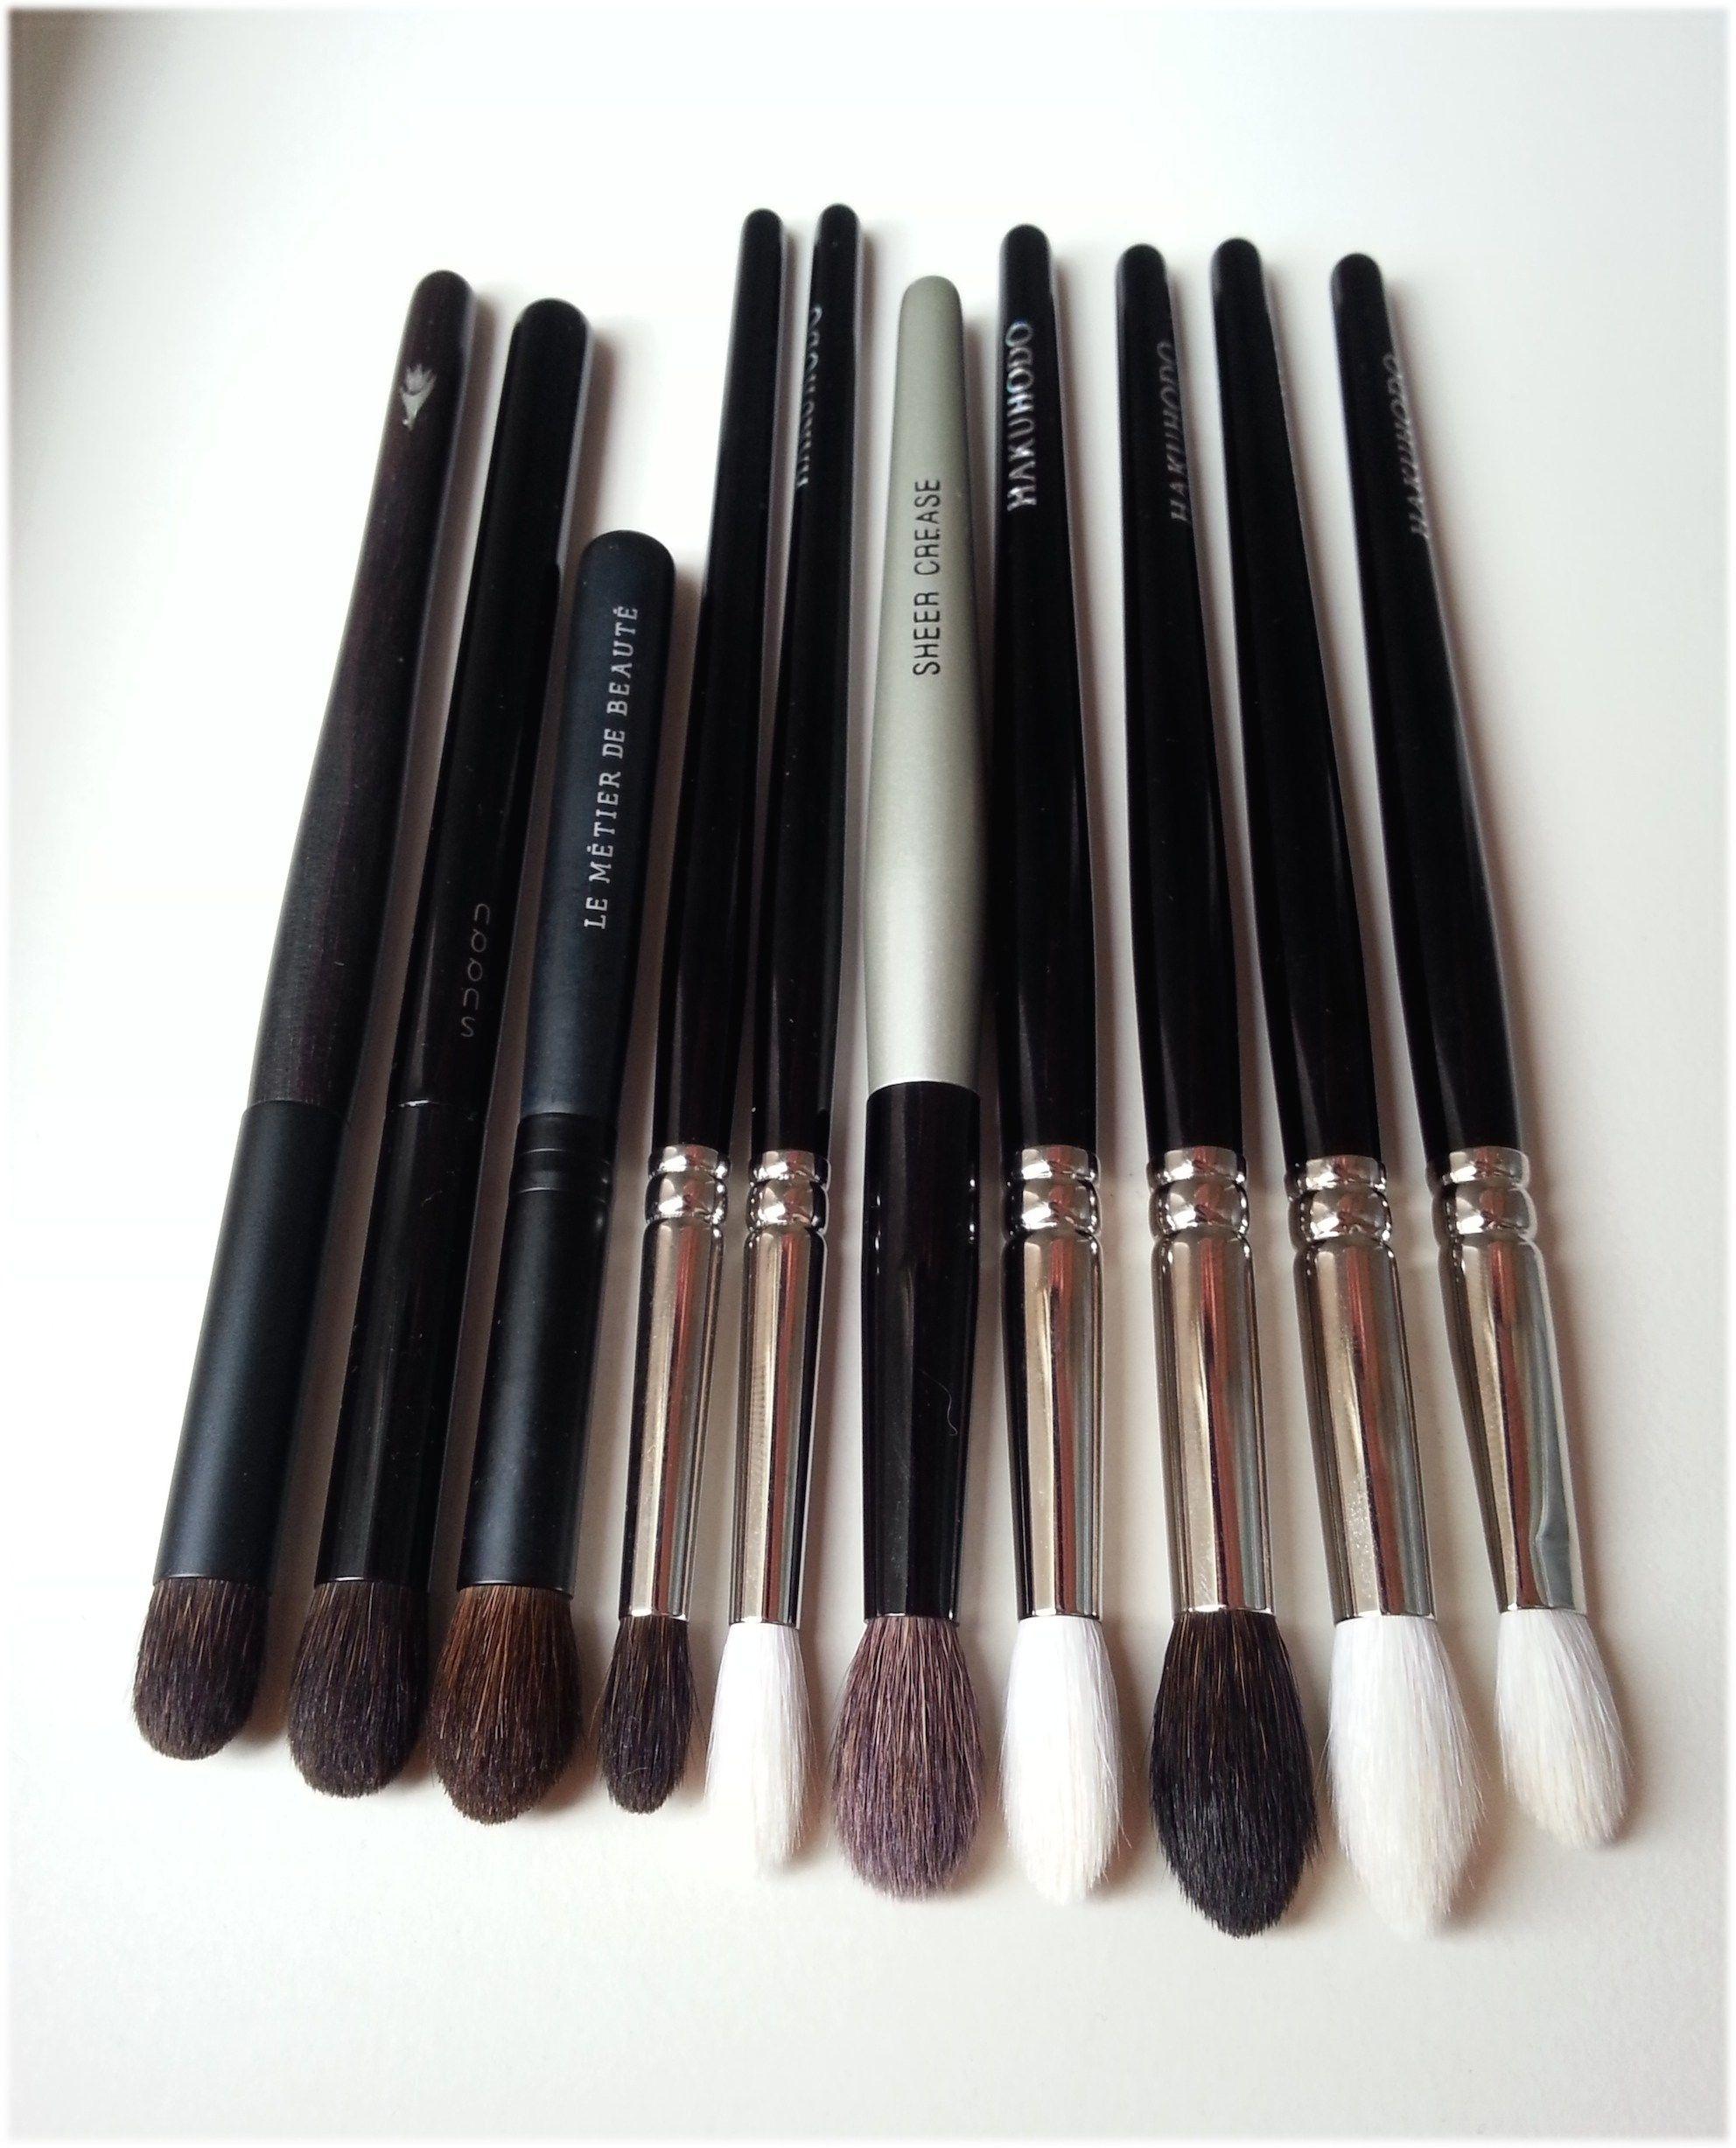 My favourite eyeshadow blending brushes Hakuhodo, Suqqu